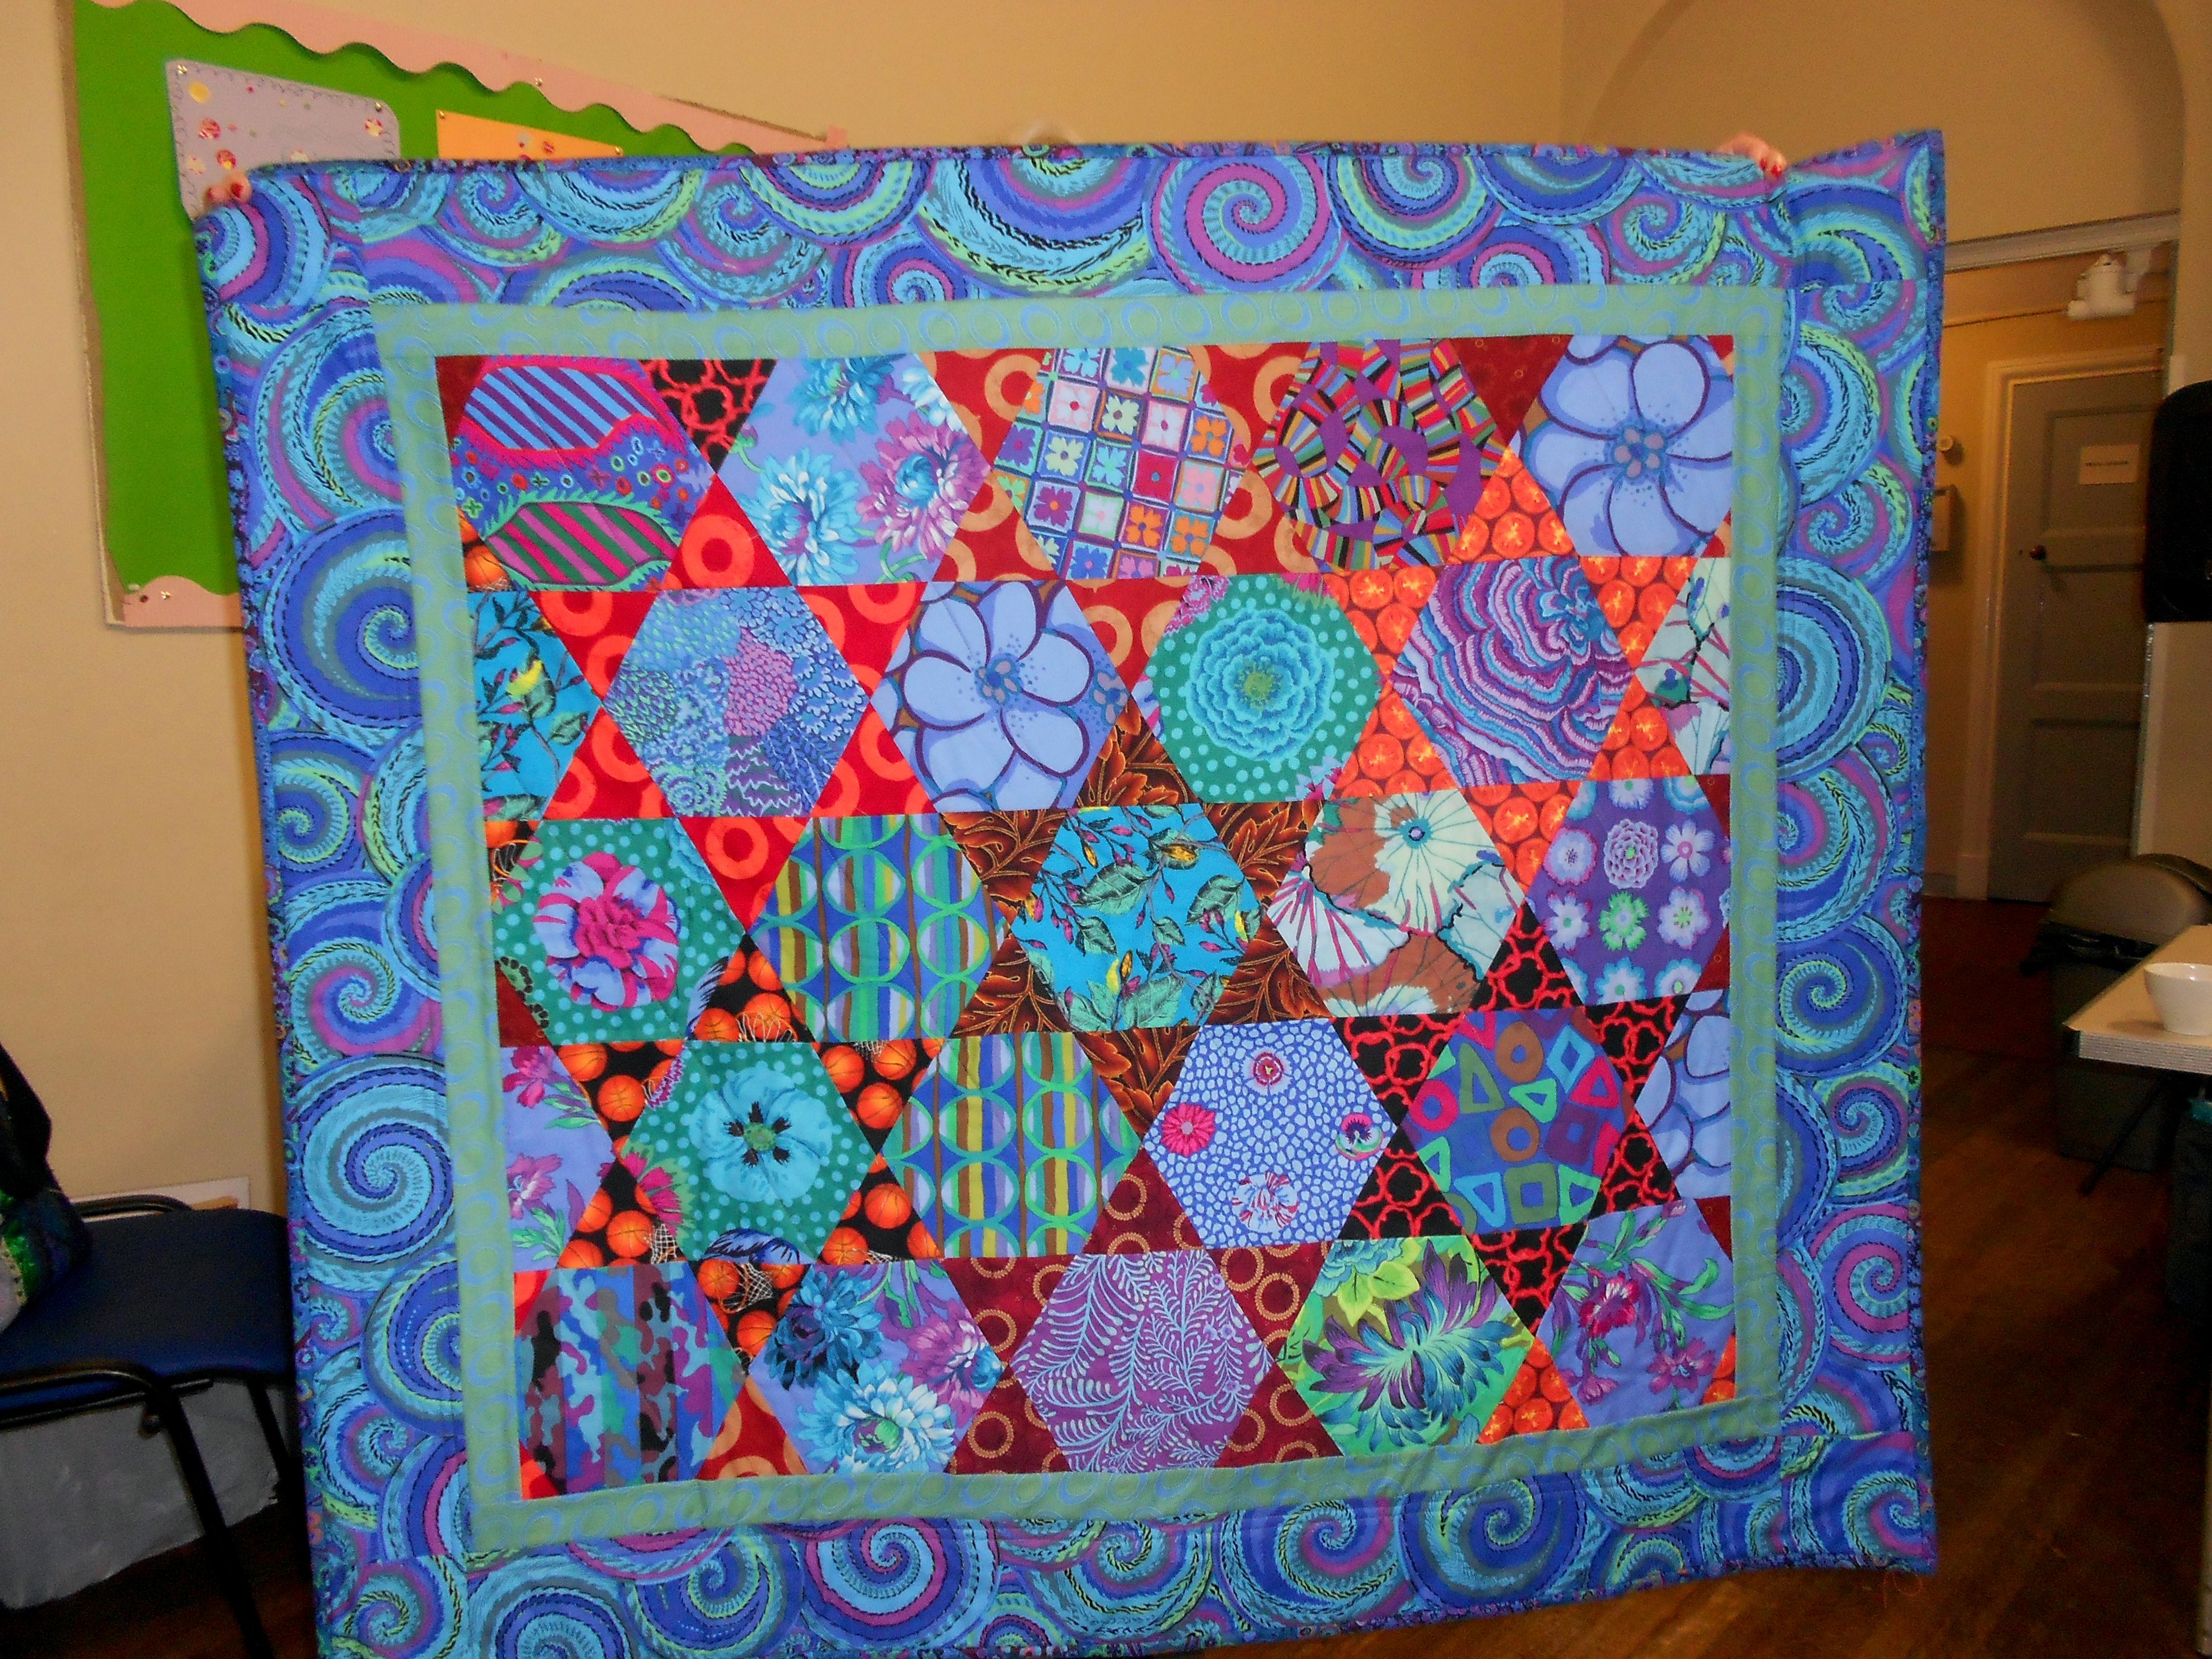 completed Kaffe Fassett quilt by Alice Bradley